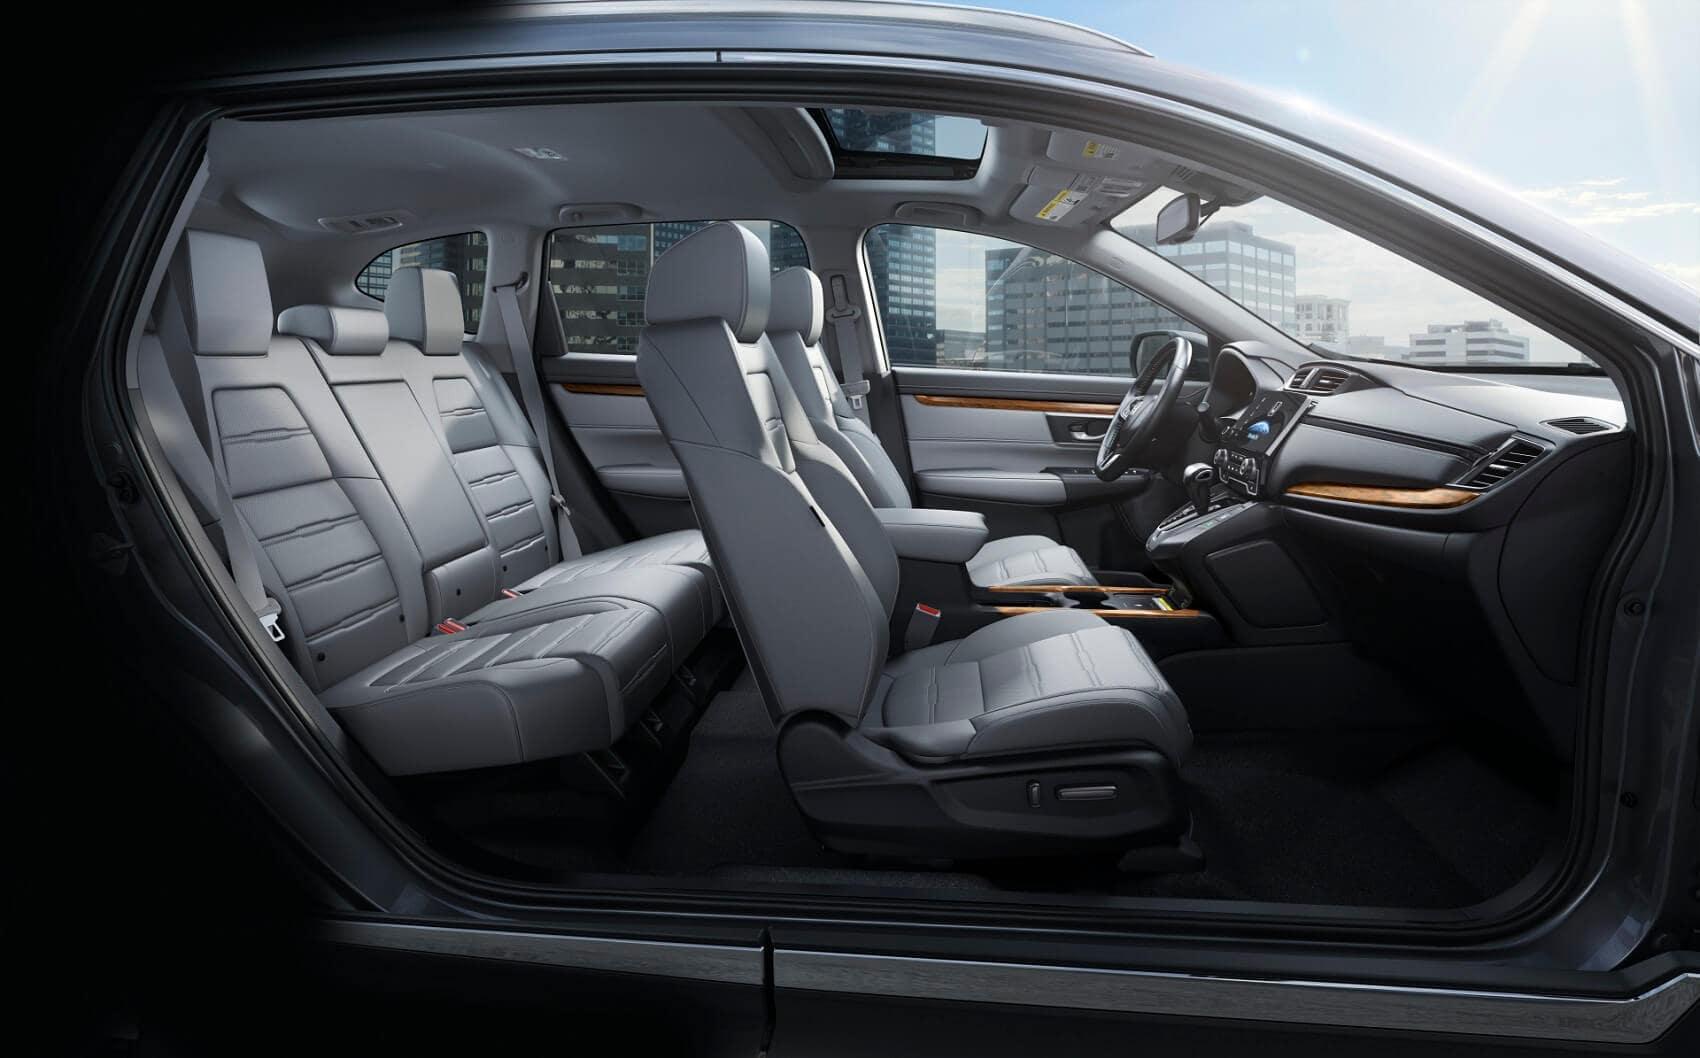 2020 Honda CR-V Interior Space